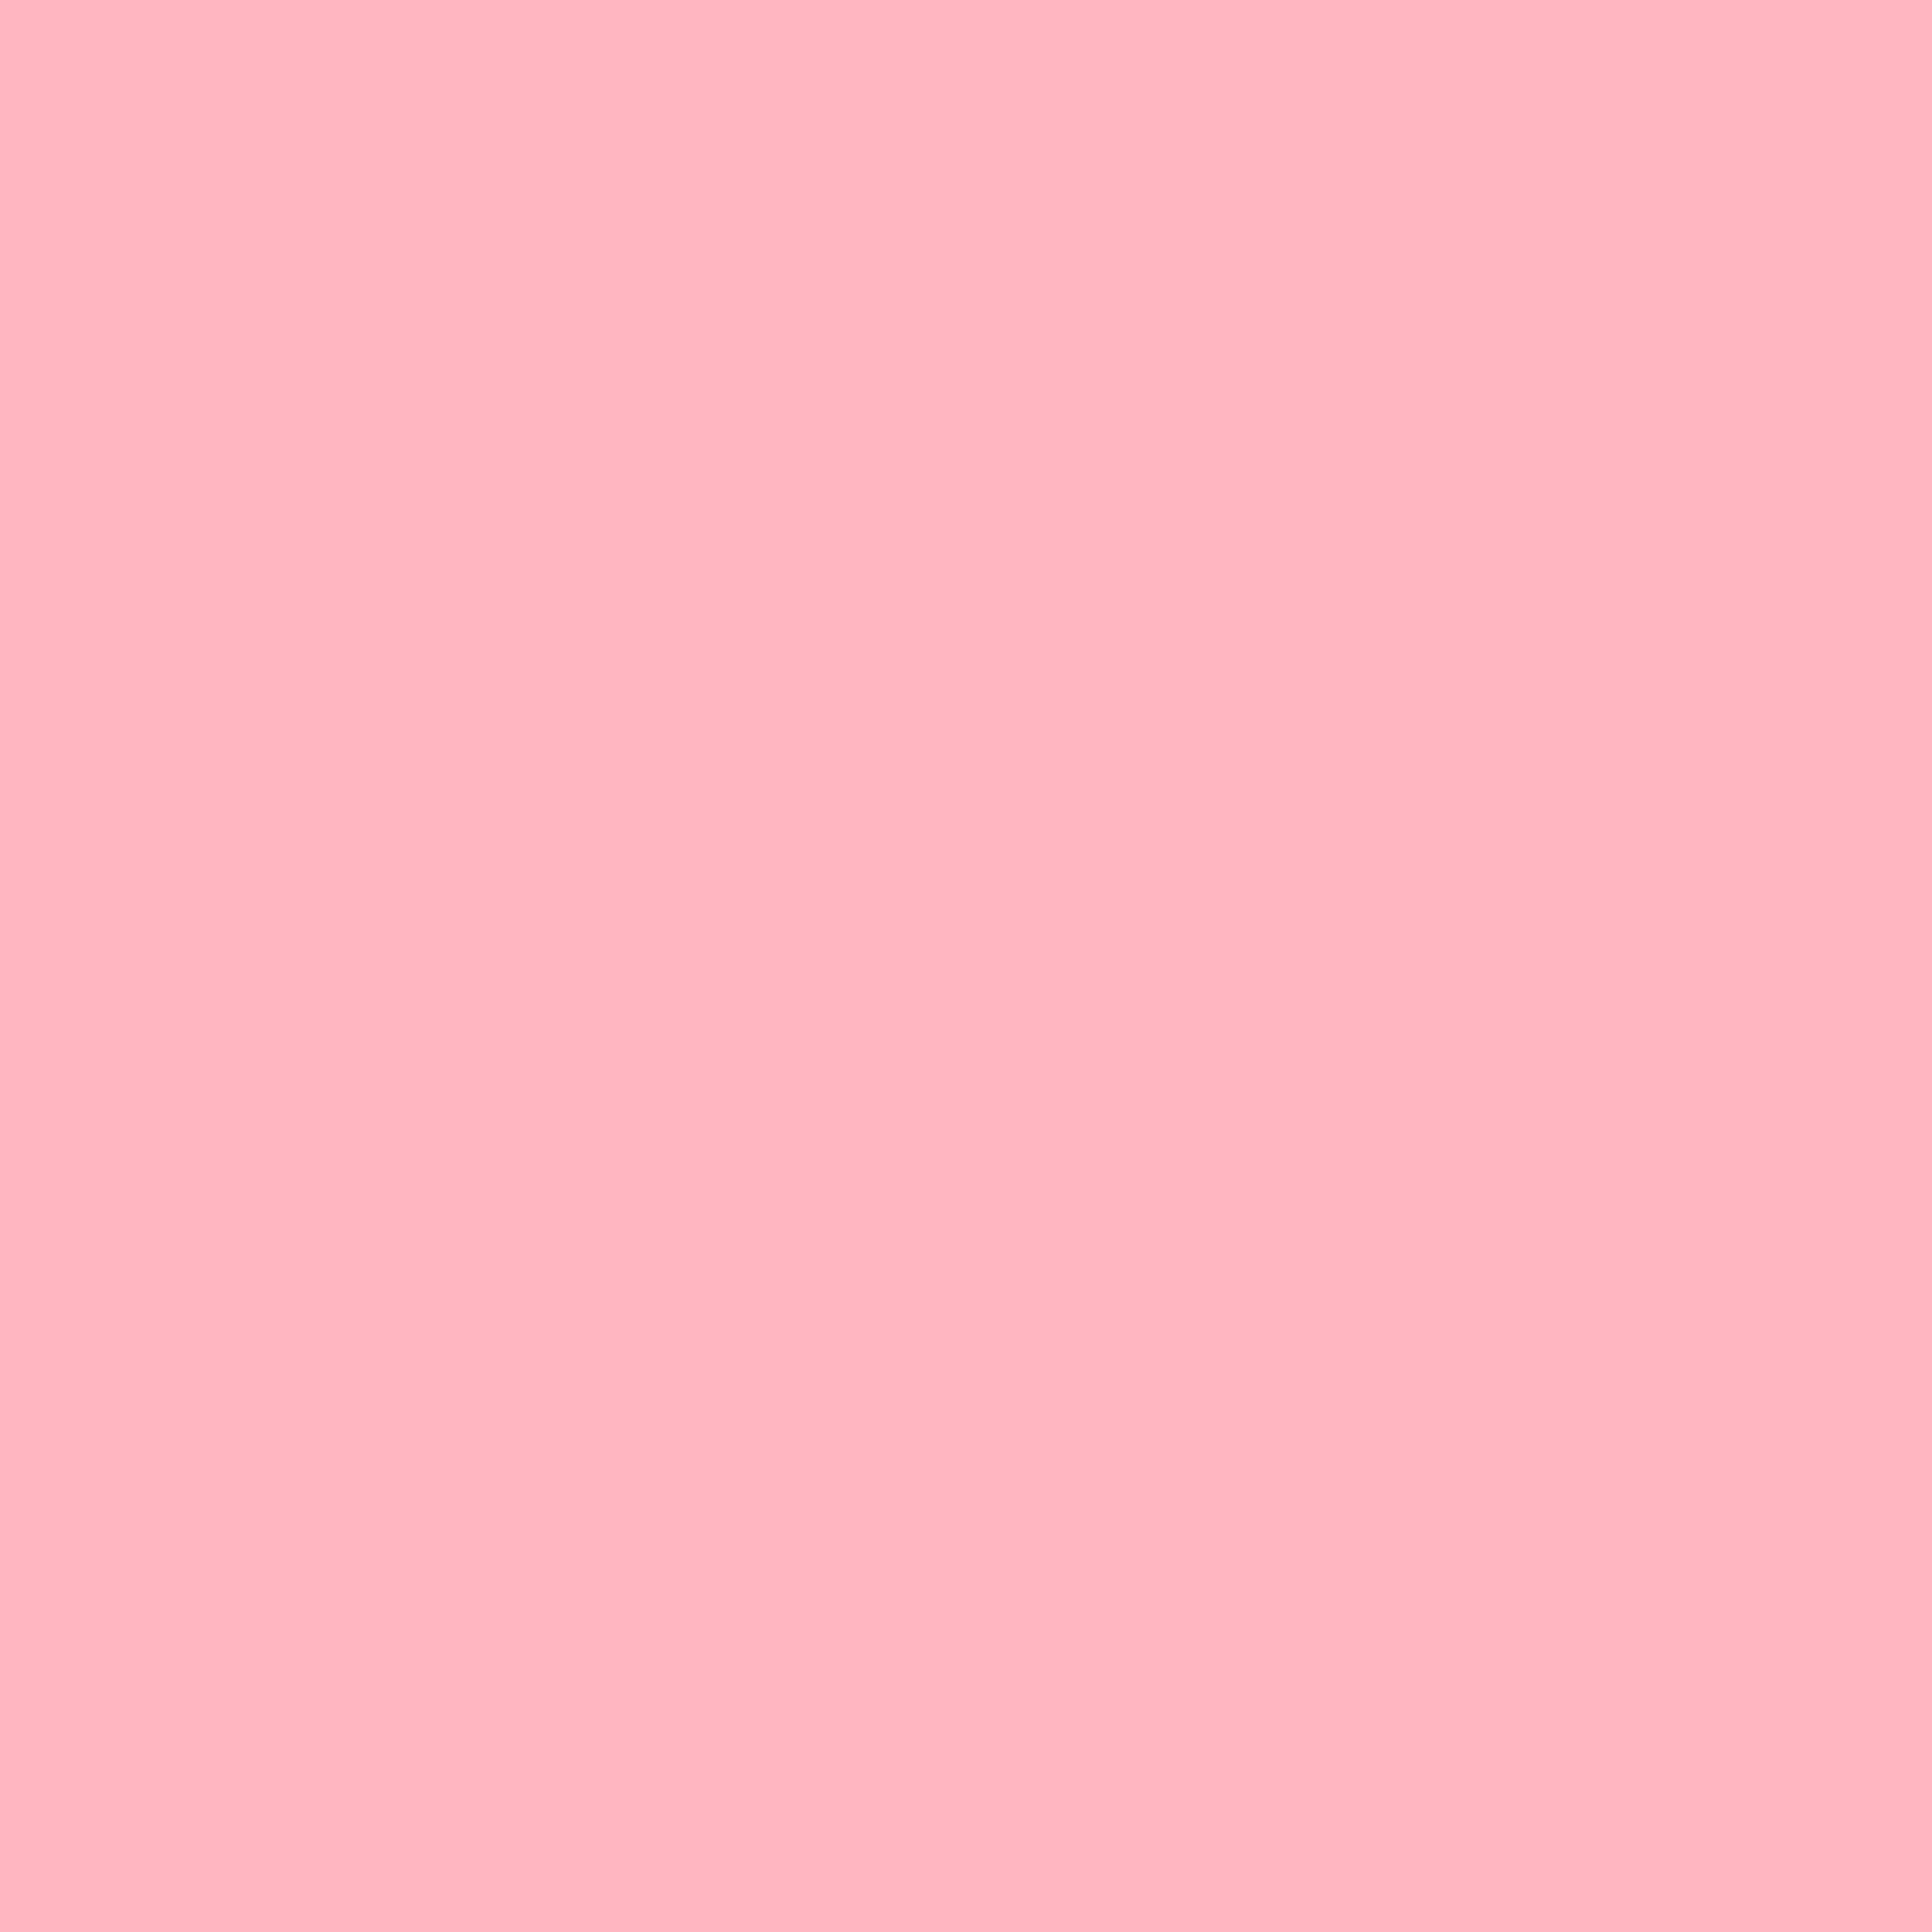 2732x2732 Light Pink Solid Color Background